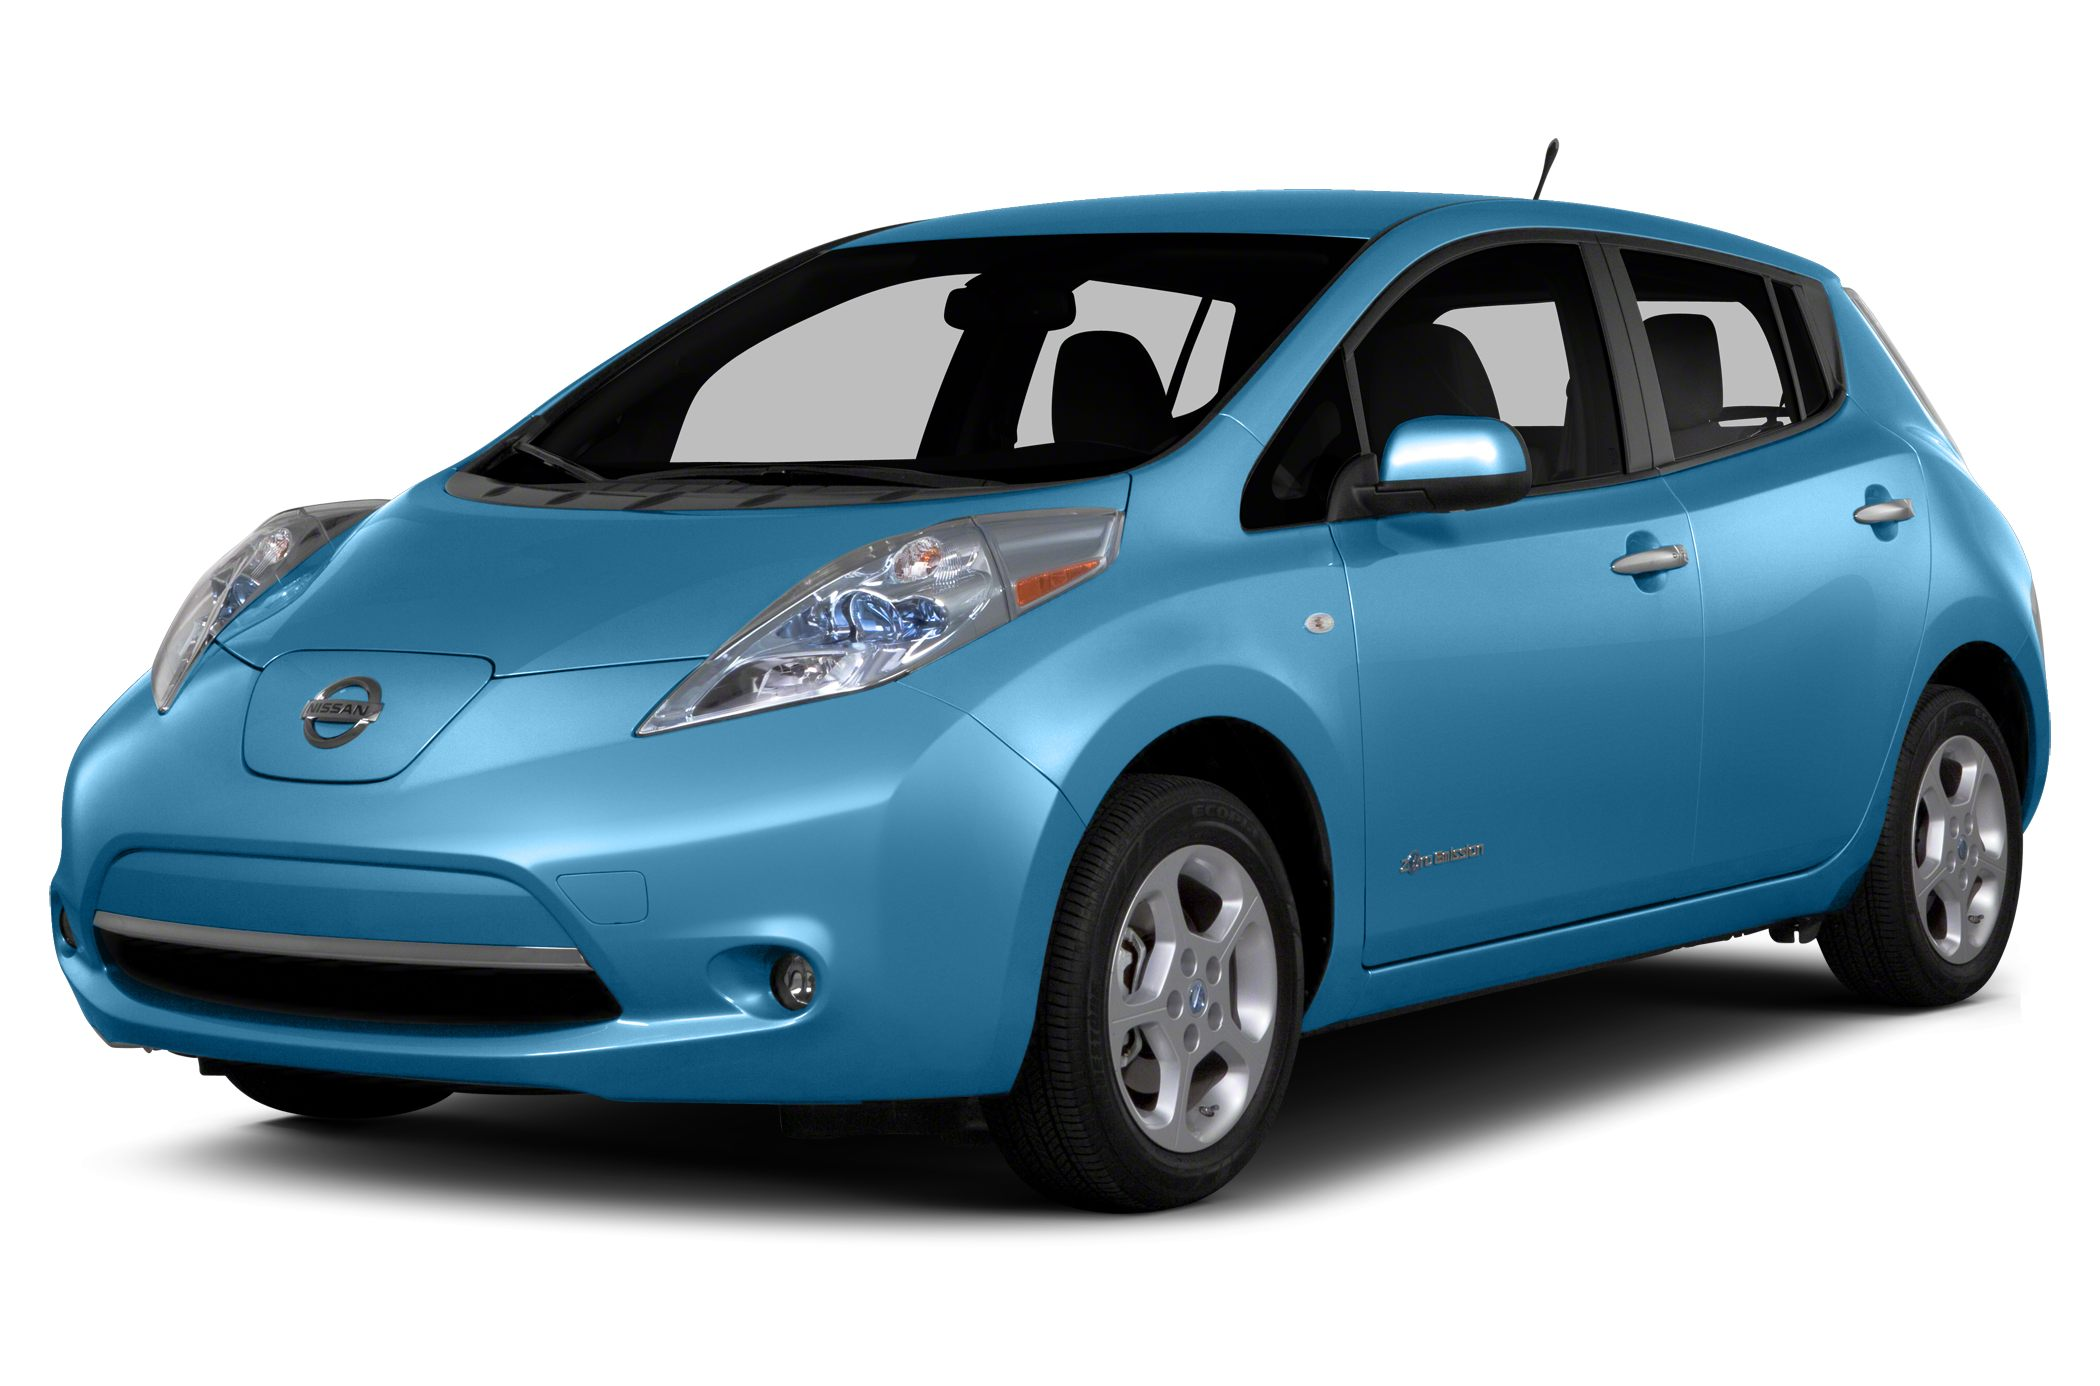 2014 Nissan Leaf S Hatchback for sale in Oakland for $31,400 with 0 miles.